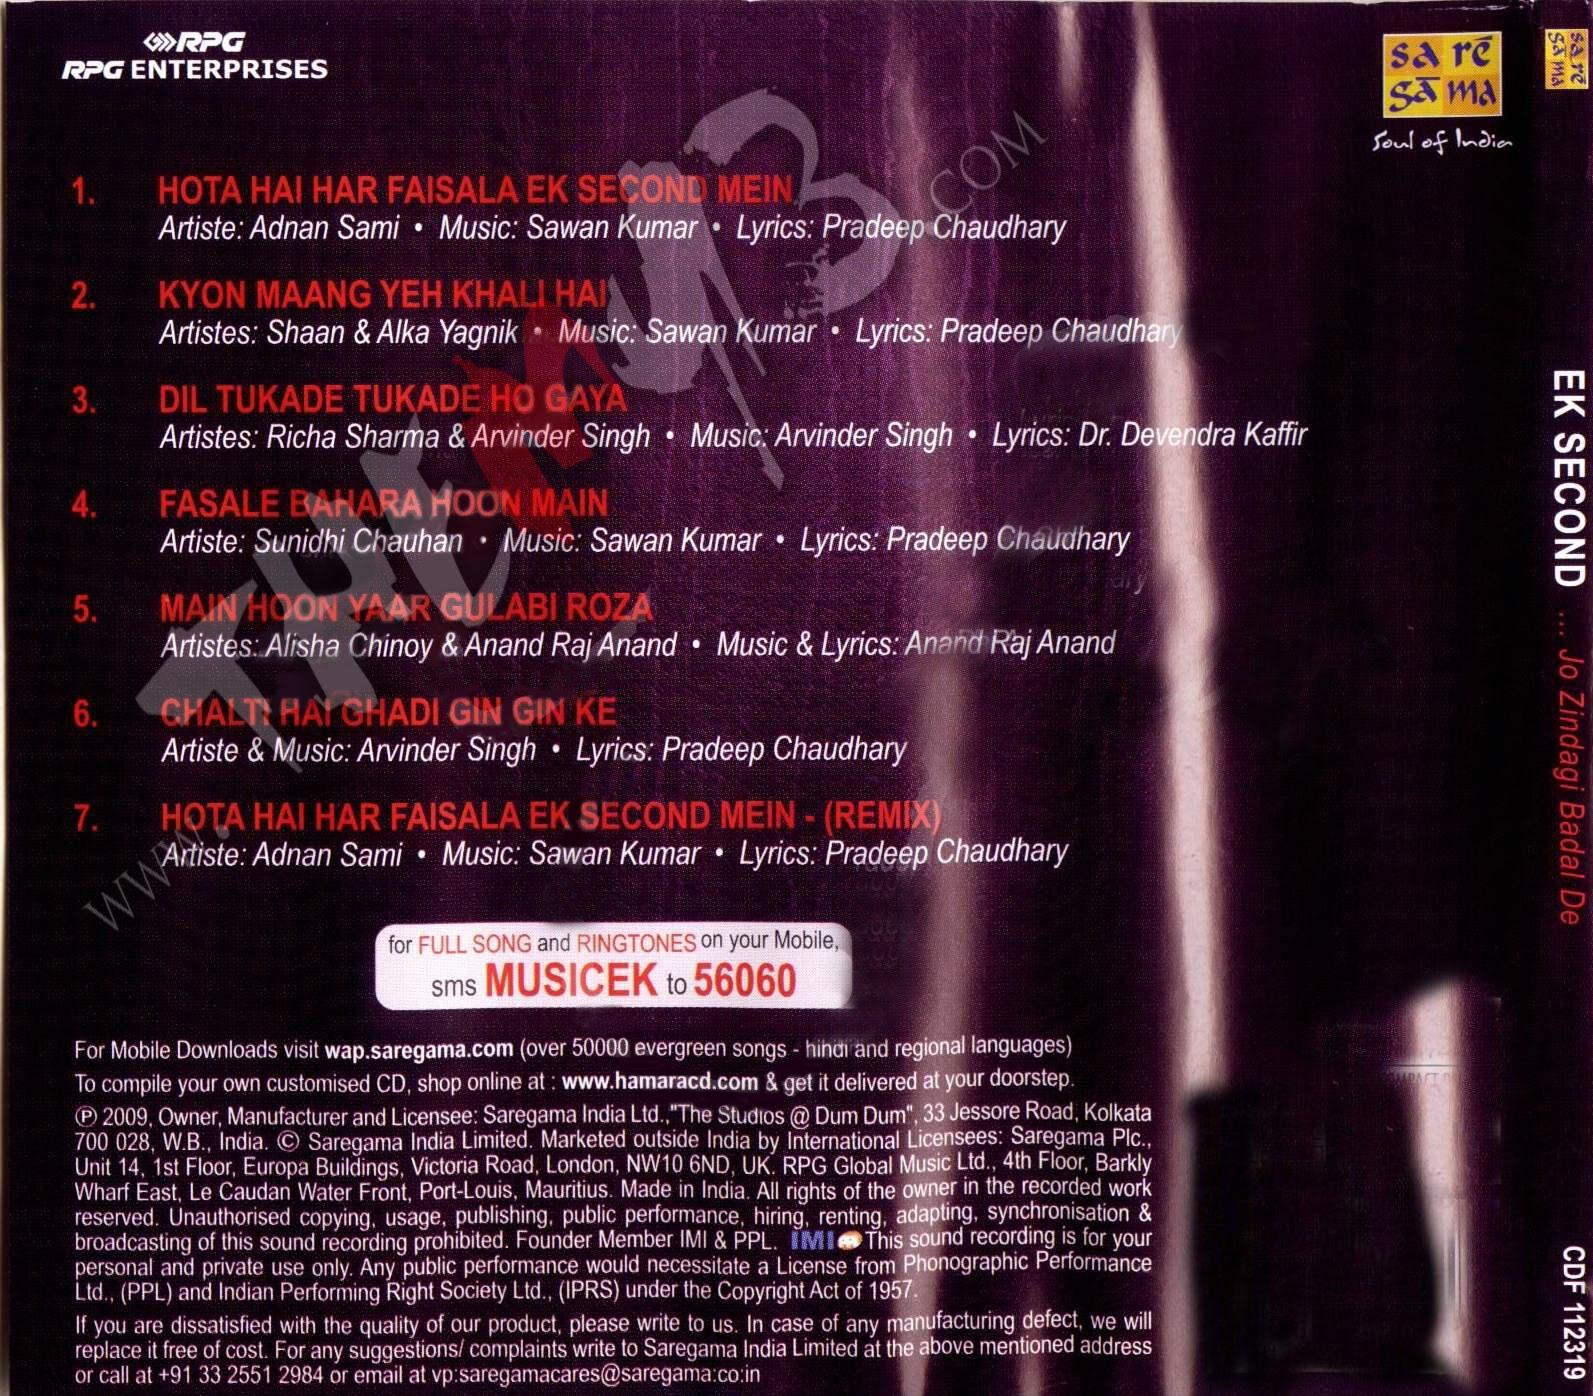 Main Woh Duniya Hoon Full Mp3 Song Dawoonllod: Ek Second (2009) Hindi Movie Mp3 Audio Songs